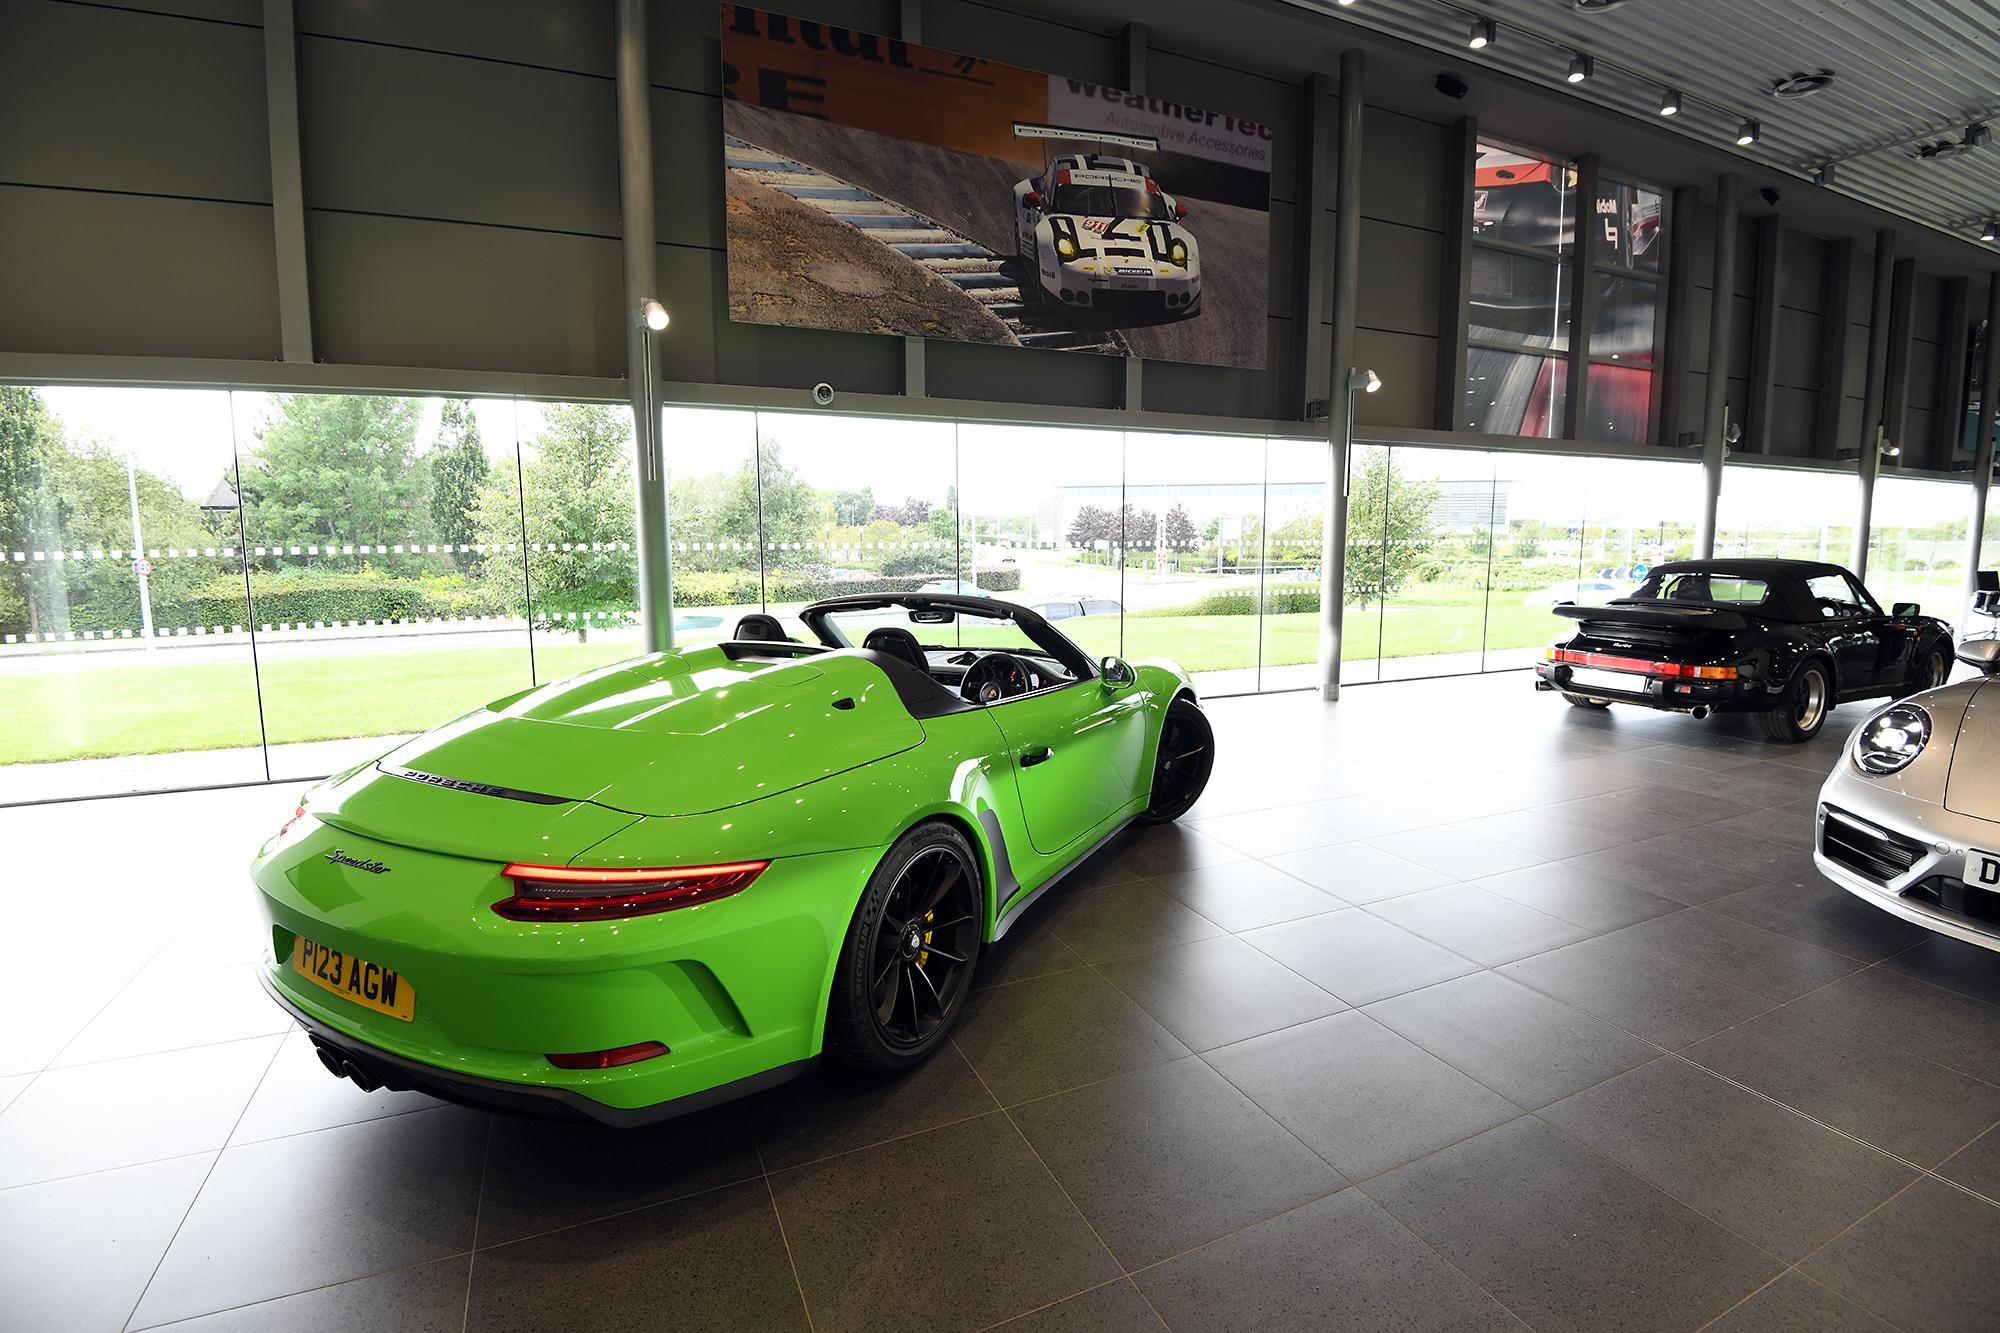 Traditional photographic image - Porsche 7